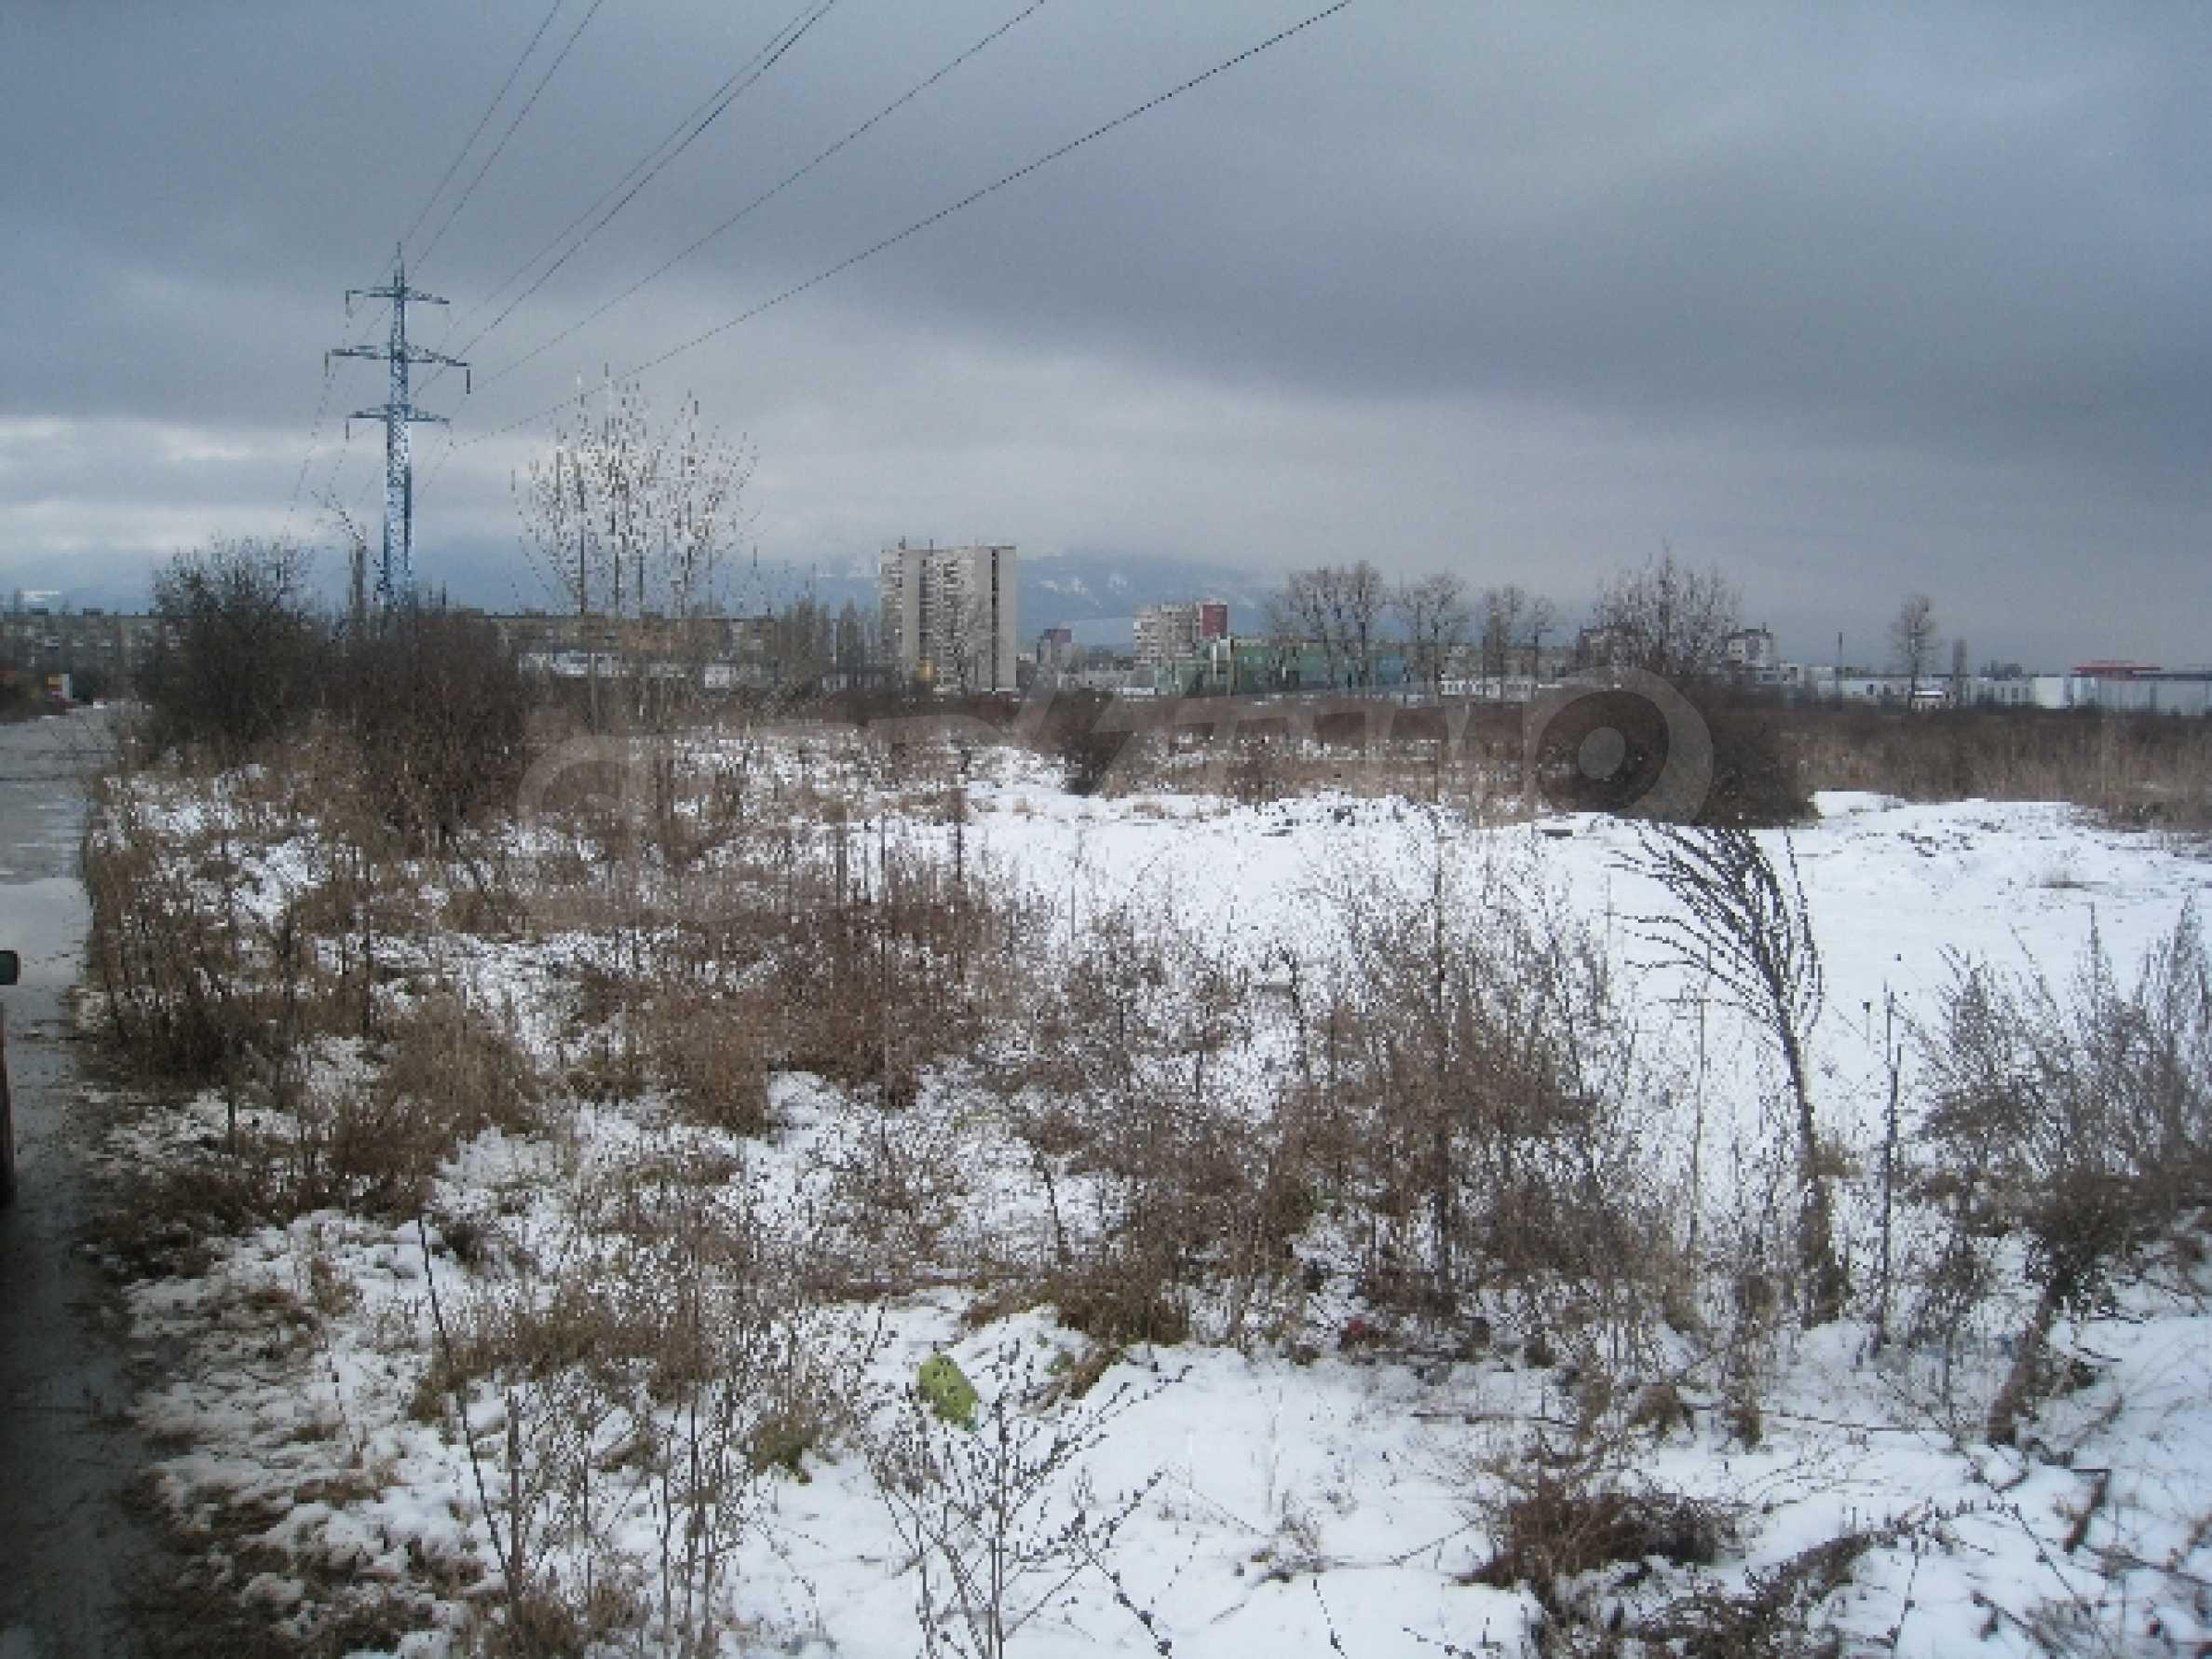 Development land near the Airport 4